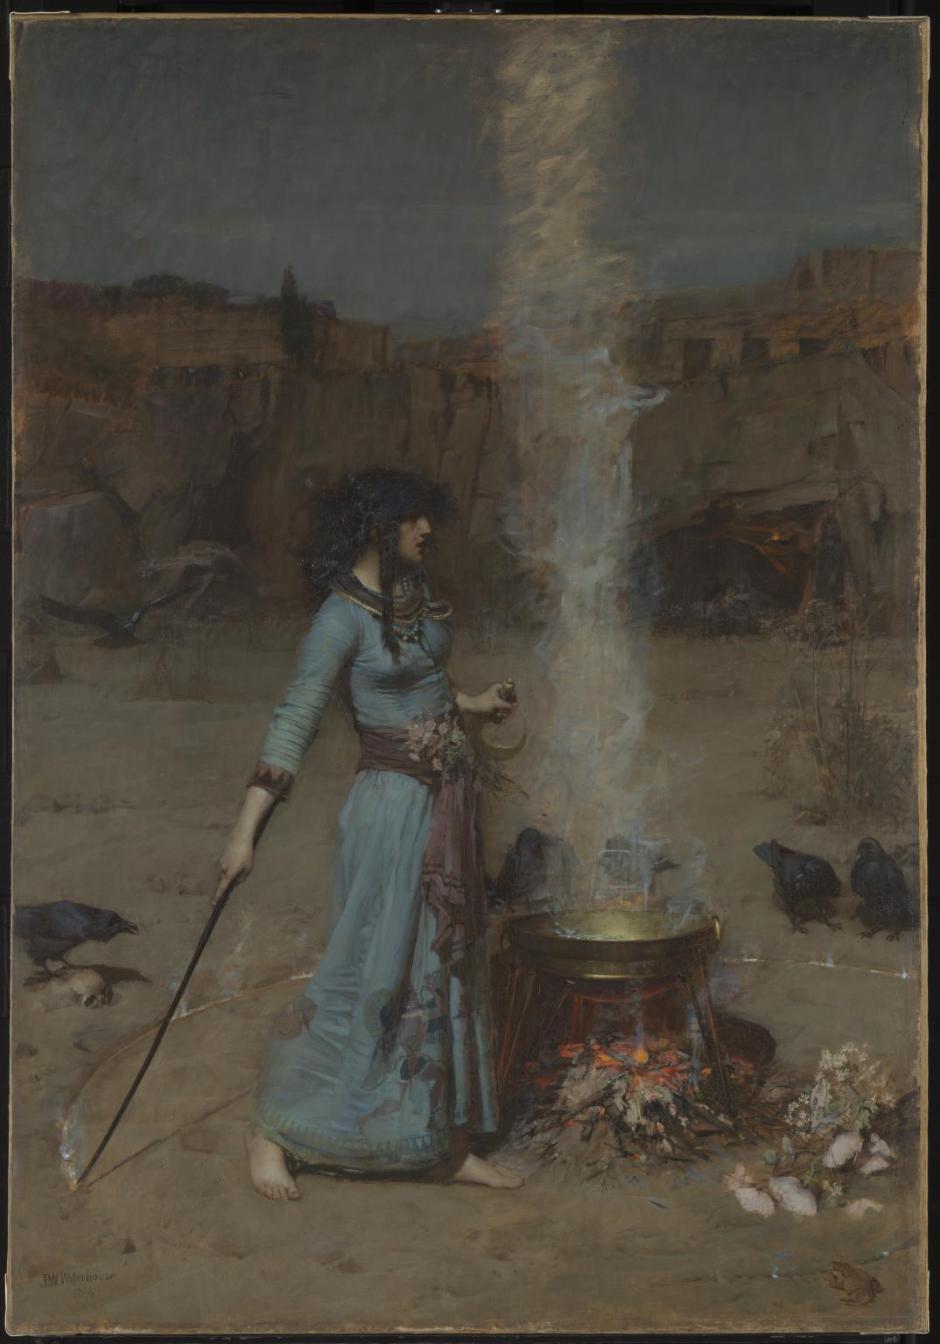 The Magic Circle 1886 by John William Waterhouse 1849-1917